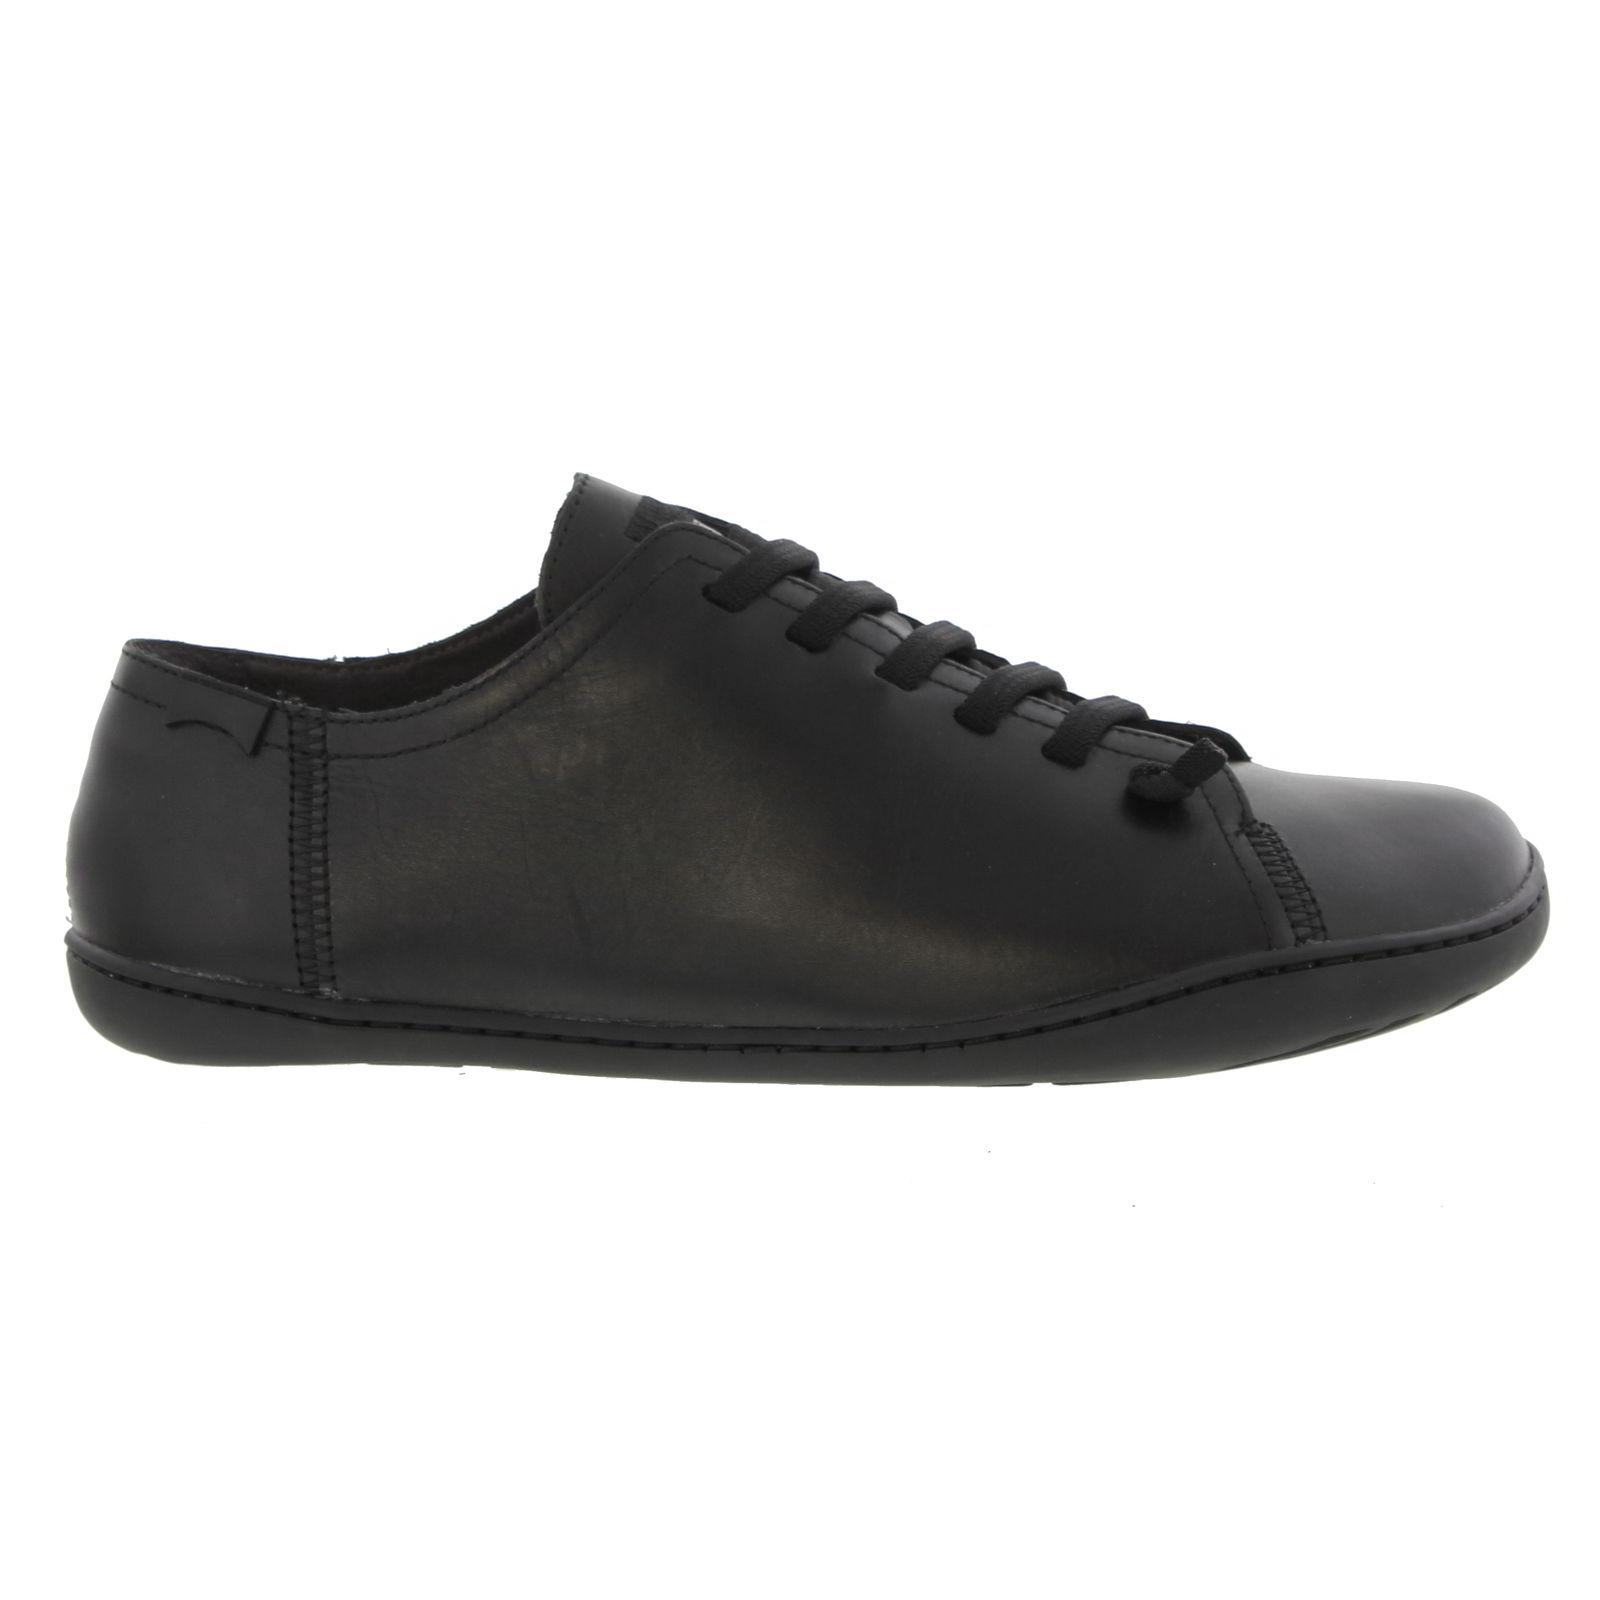 Camper Mens Peu Cami 17665 Leather Shoes - 014 Black